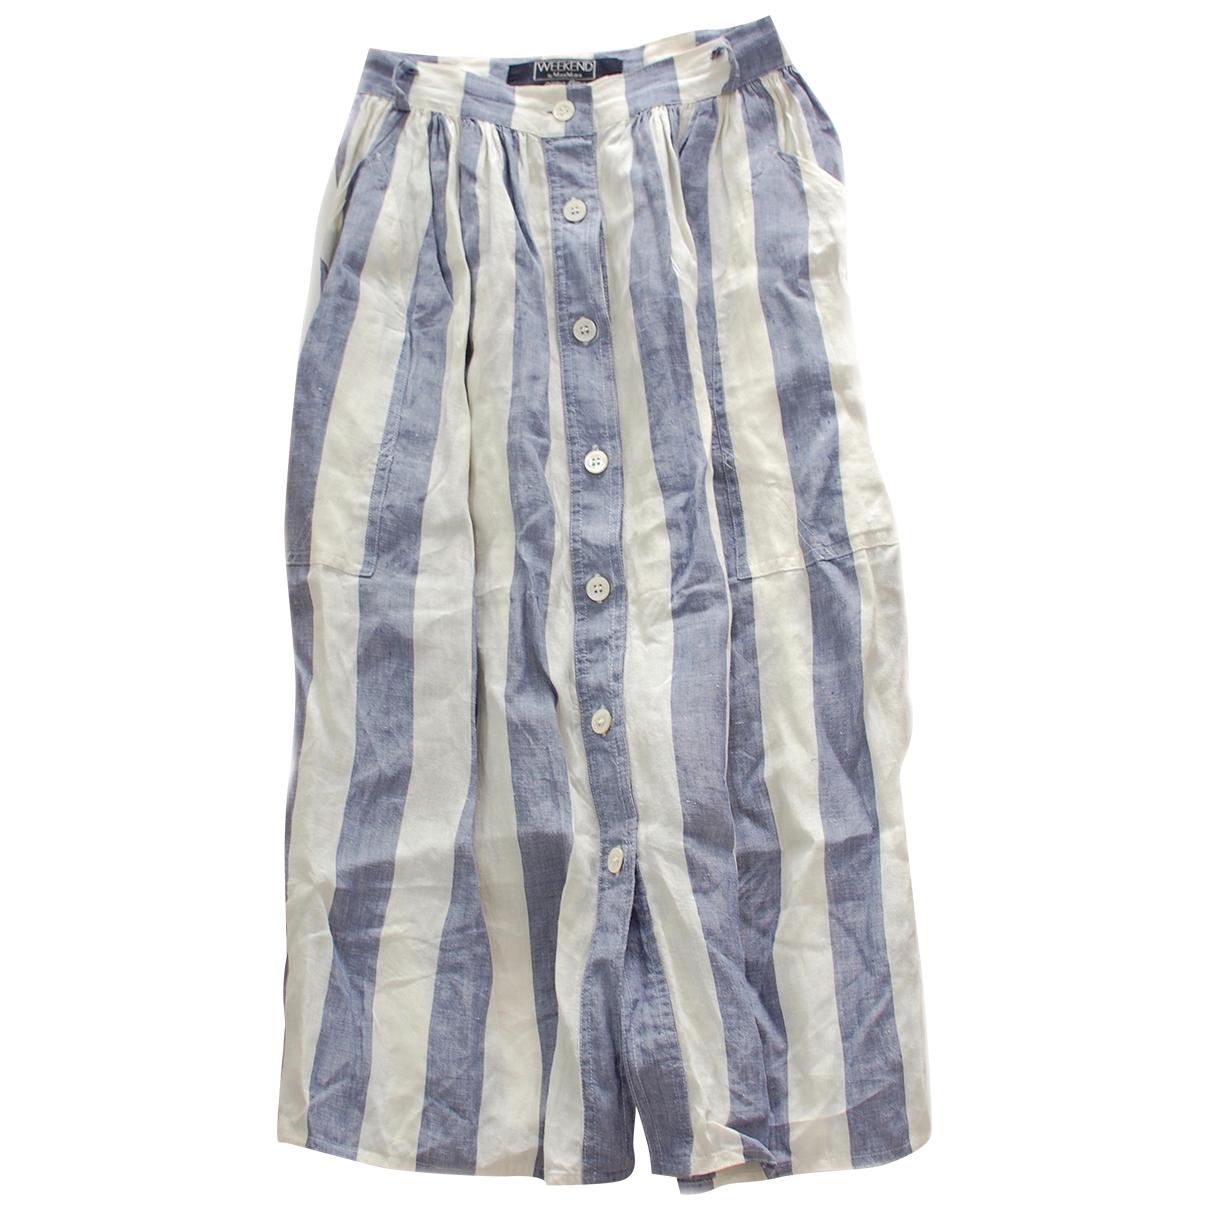 Max Mara Weekend \N Multicolour Linen skirt for Women 38 IT